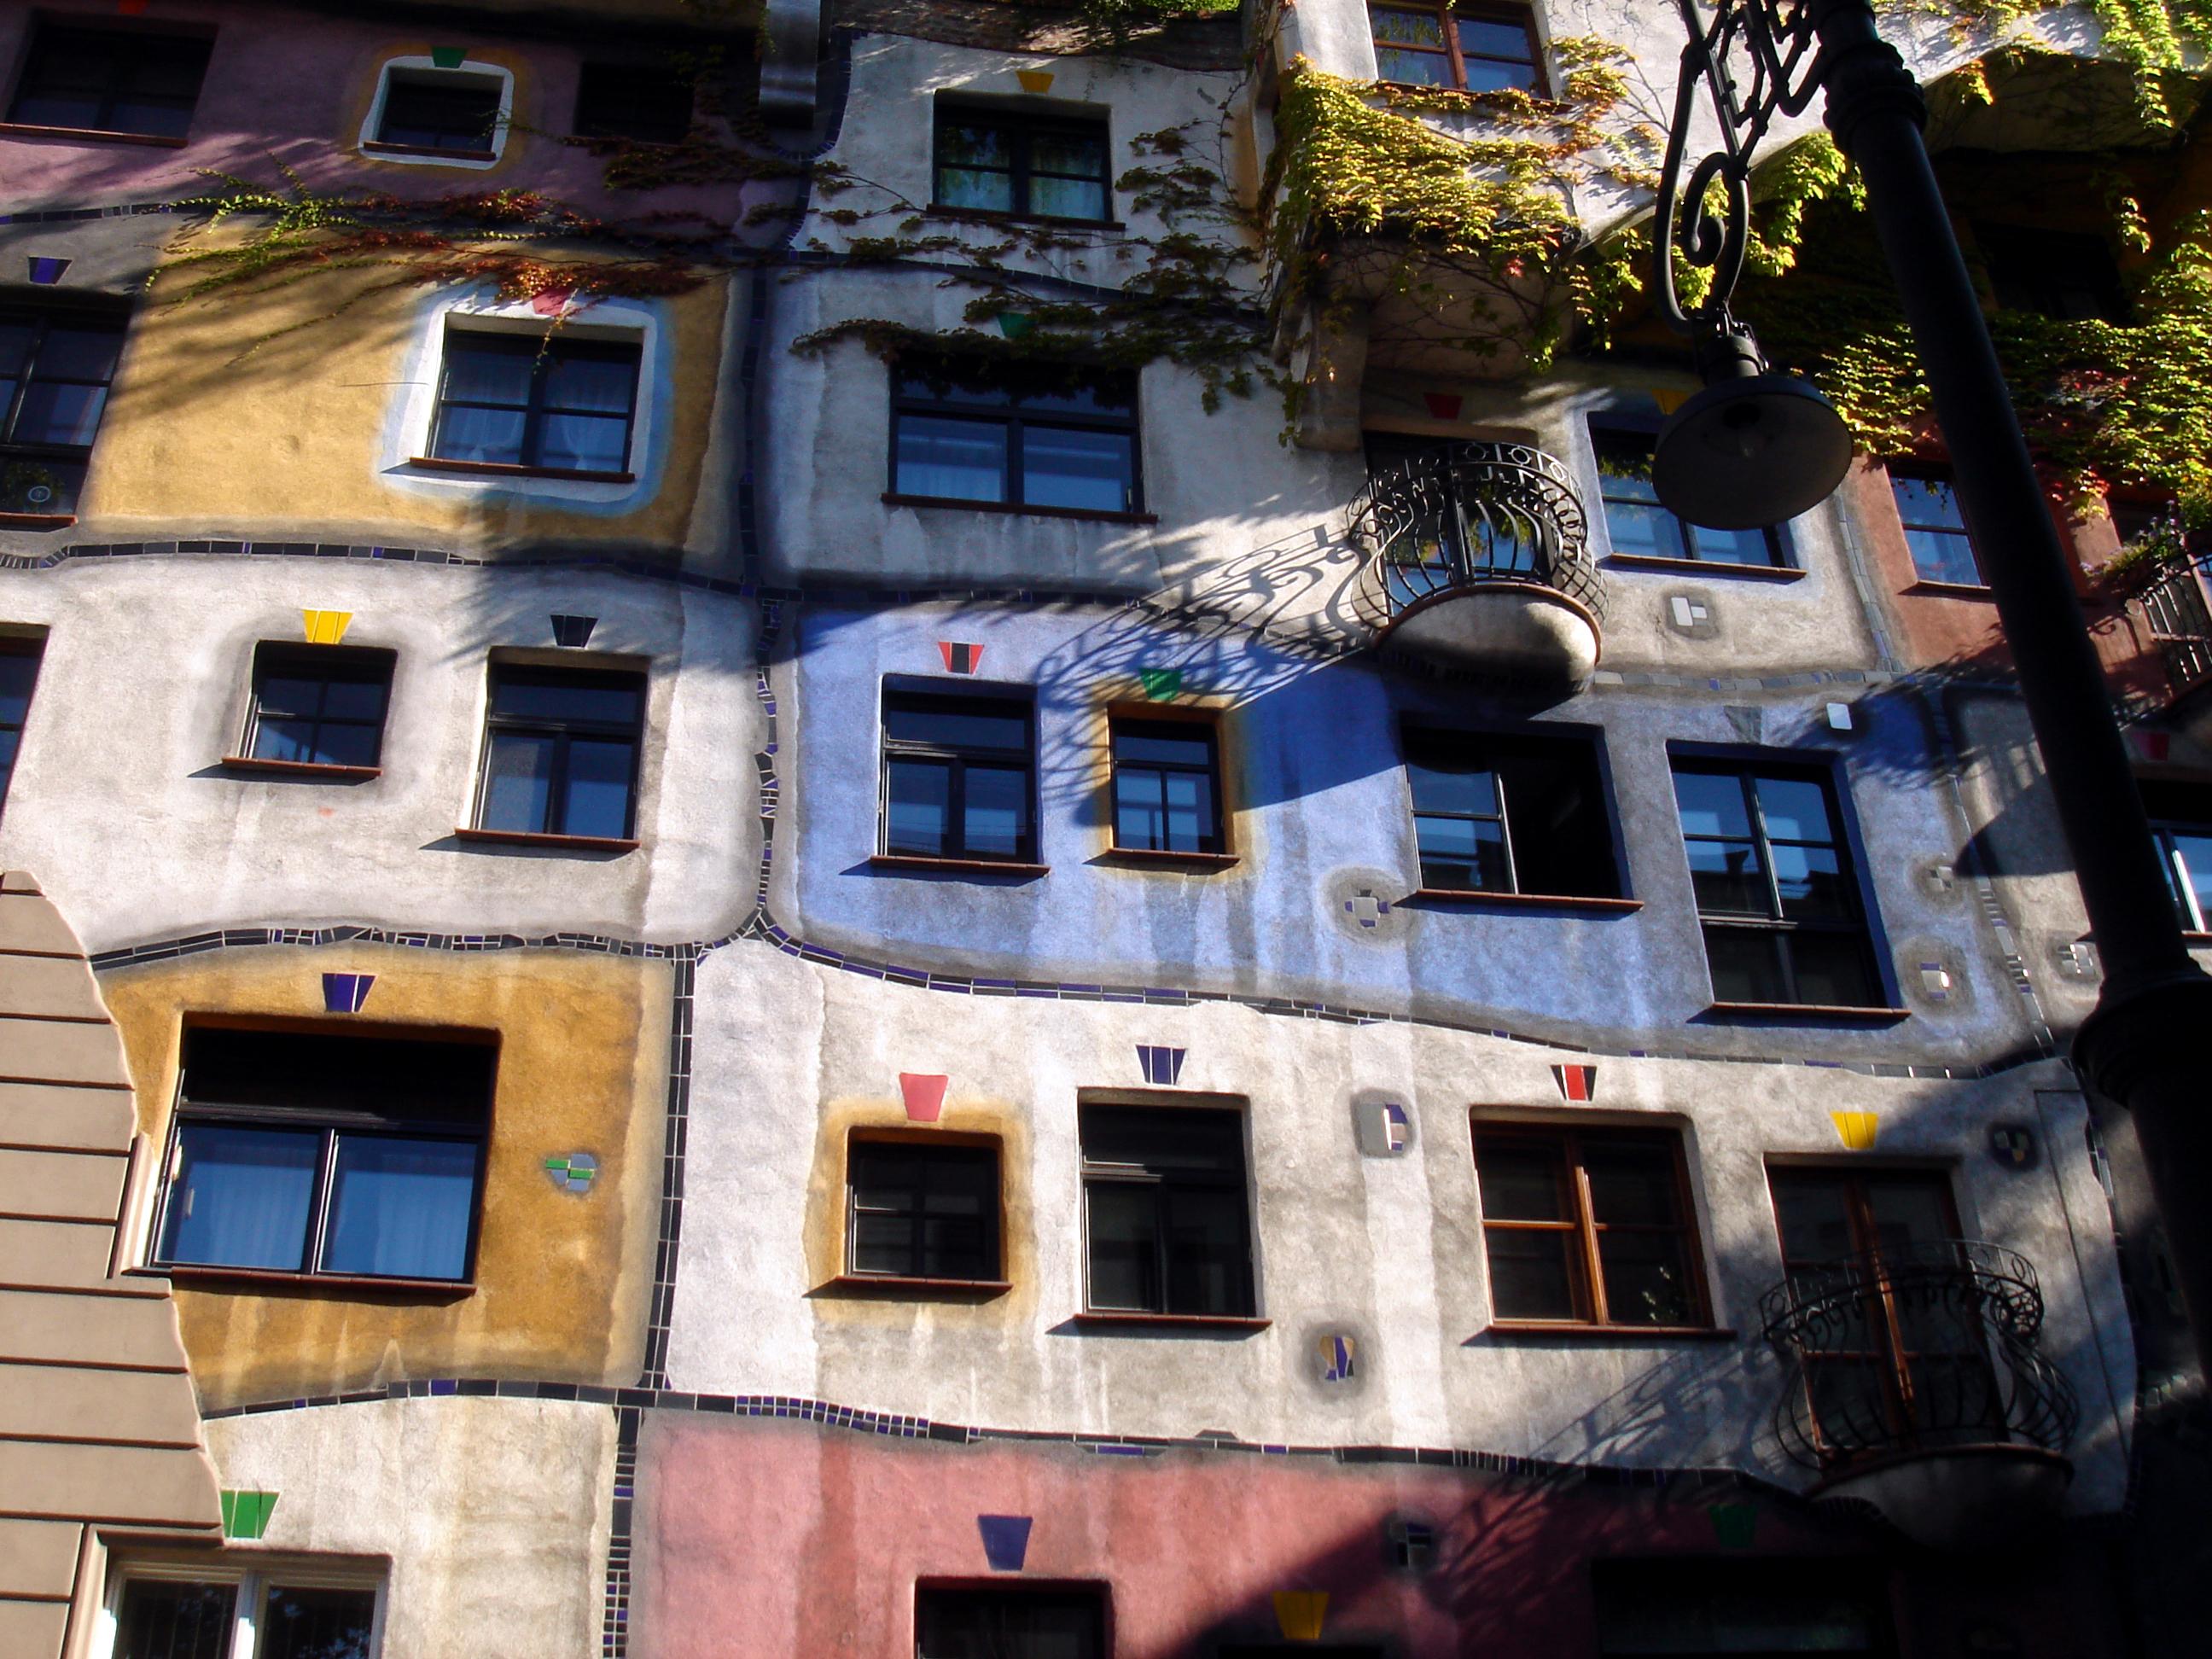 Bytový dům - Hundertwasserhaus - Friedensreich Hundertwasser